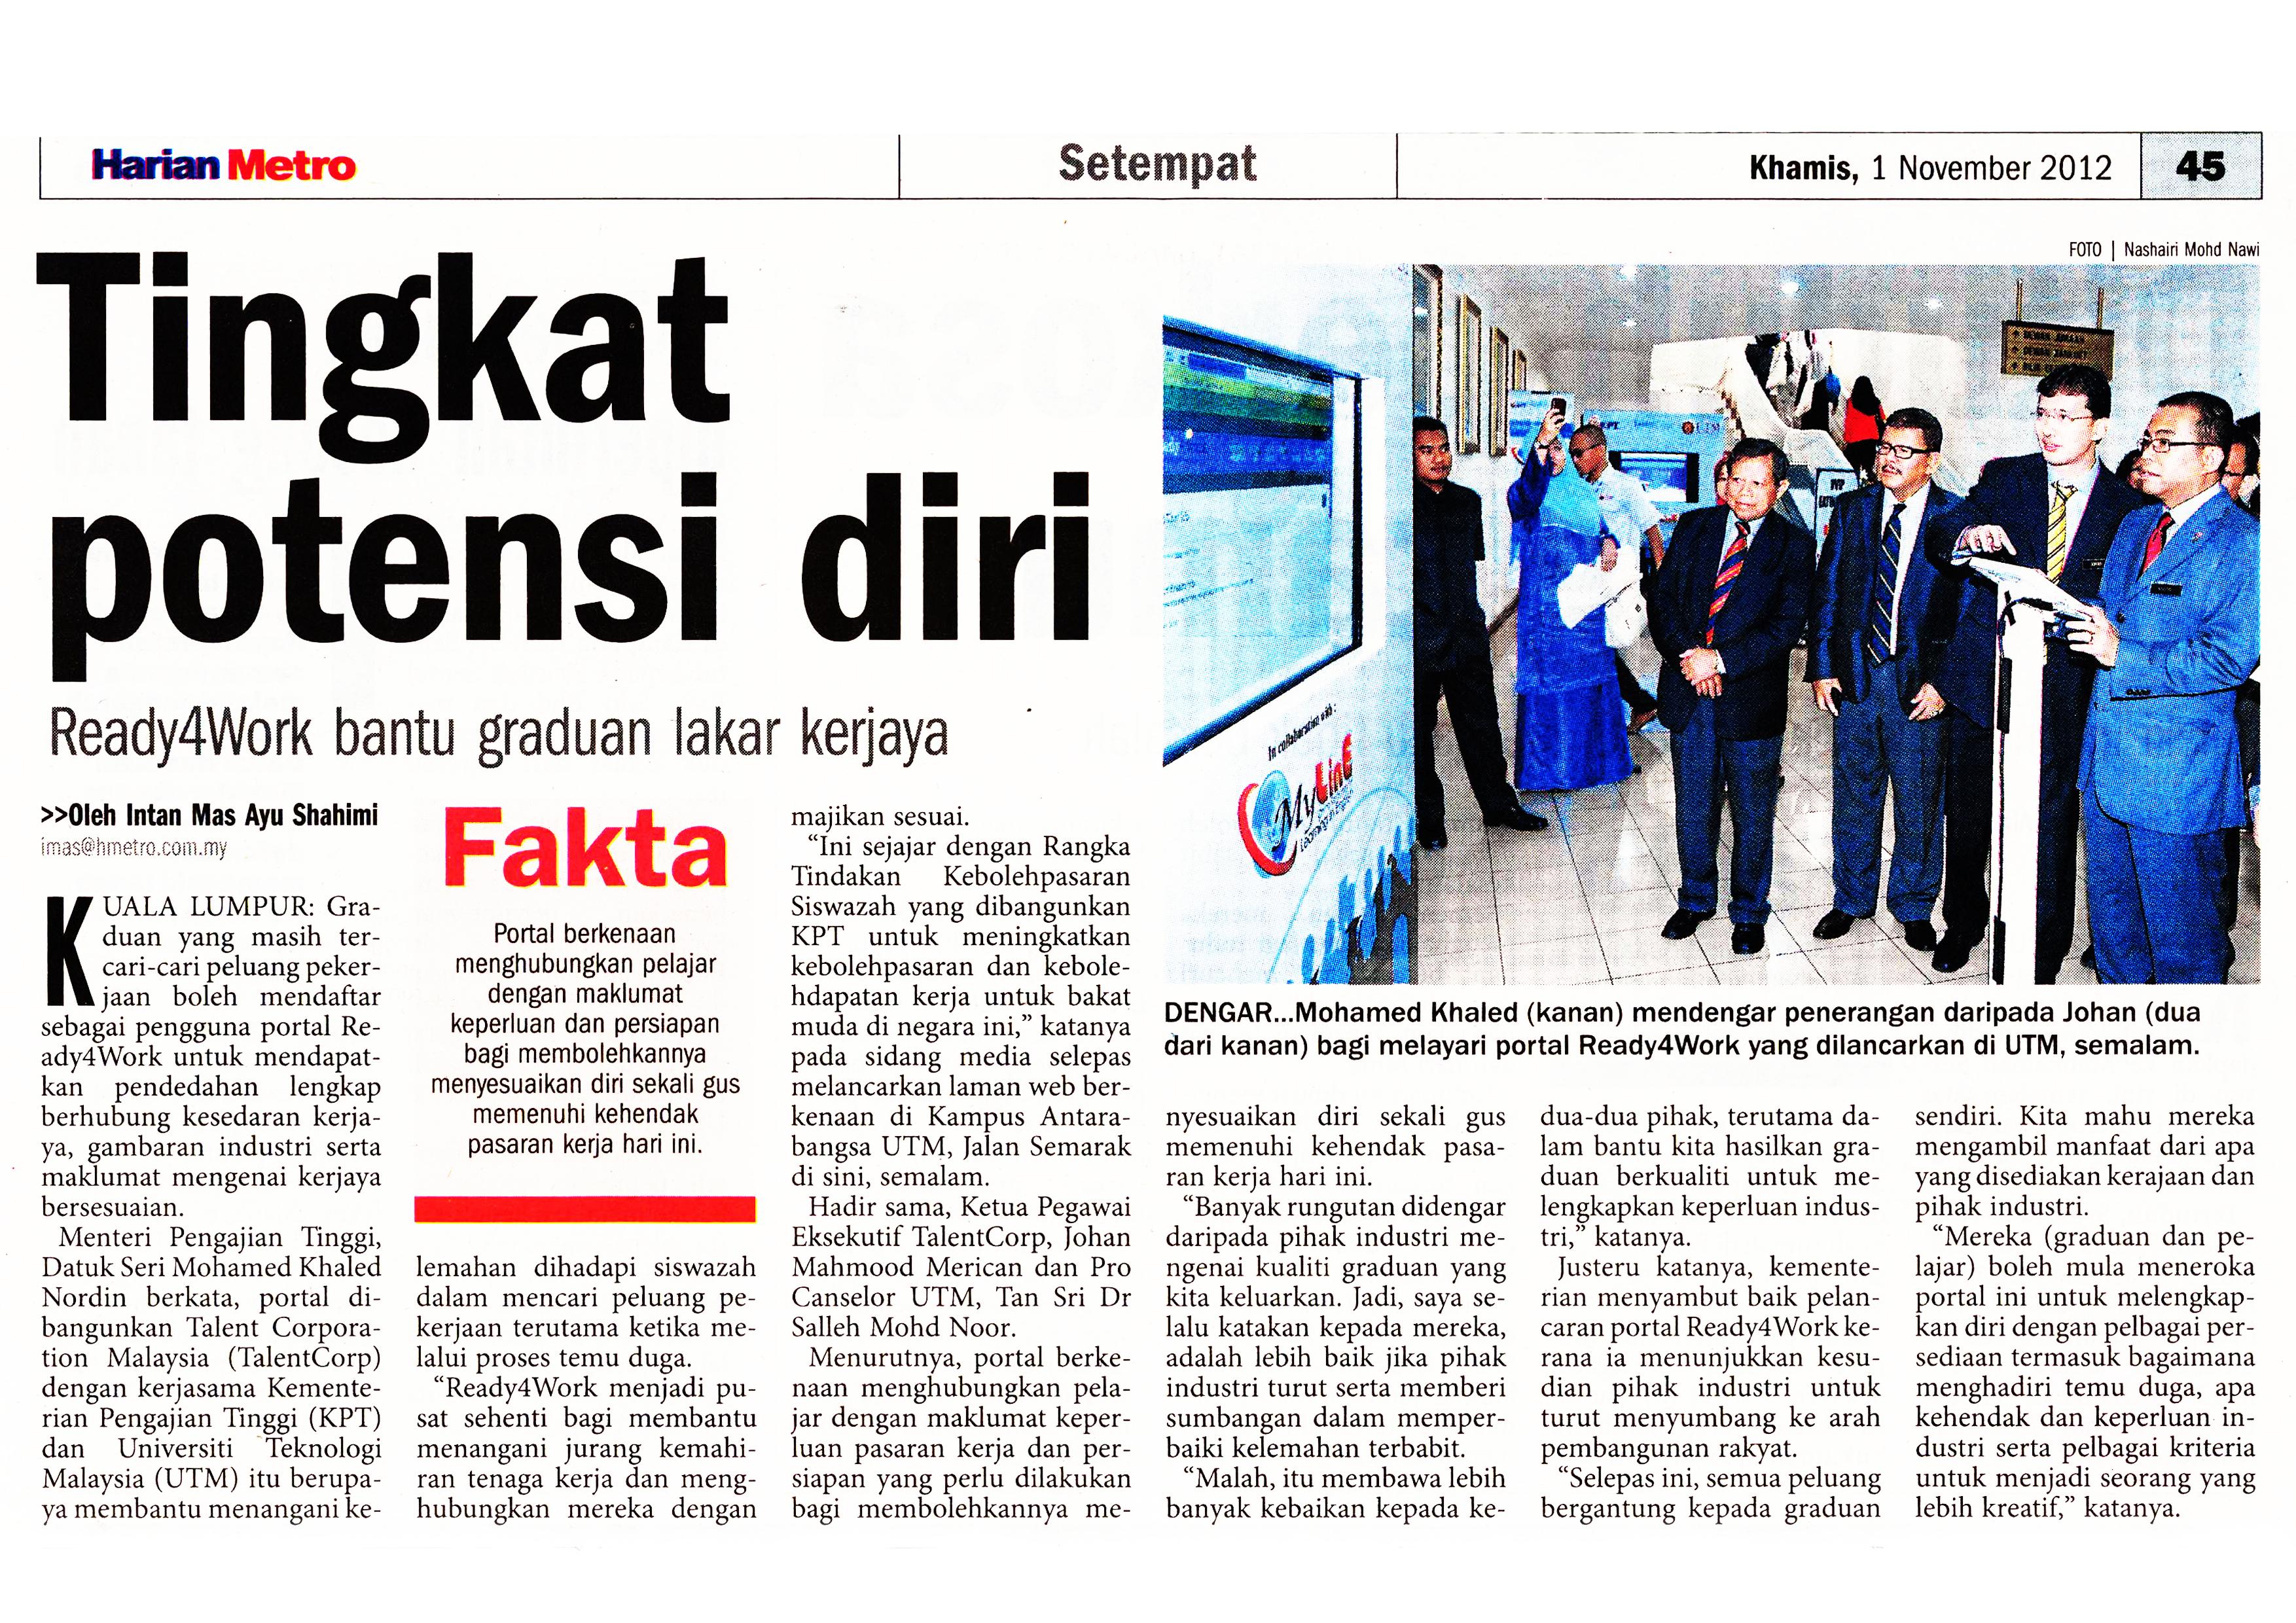 Harian Metro, 1 November 2012